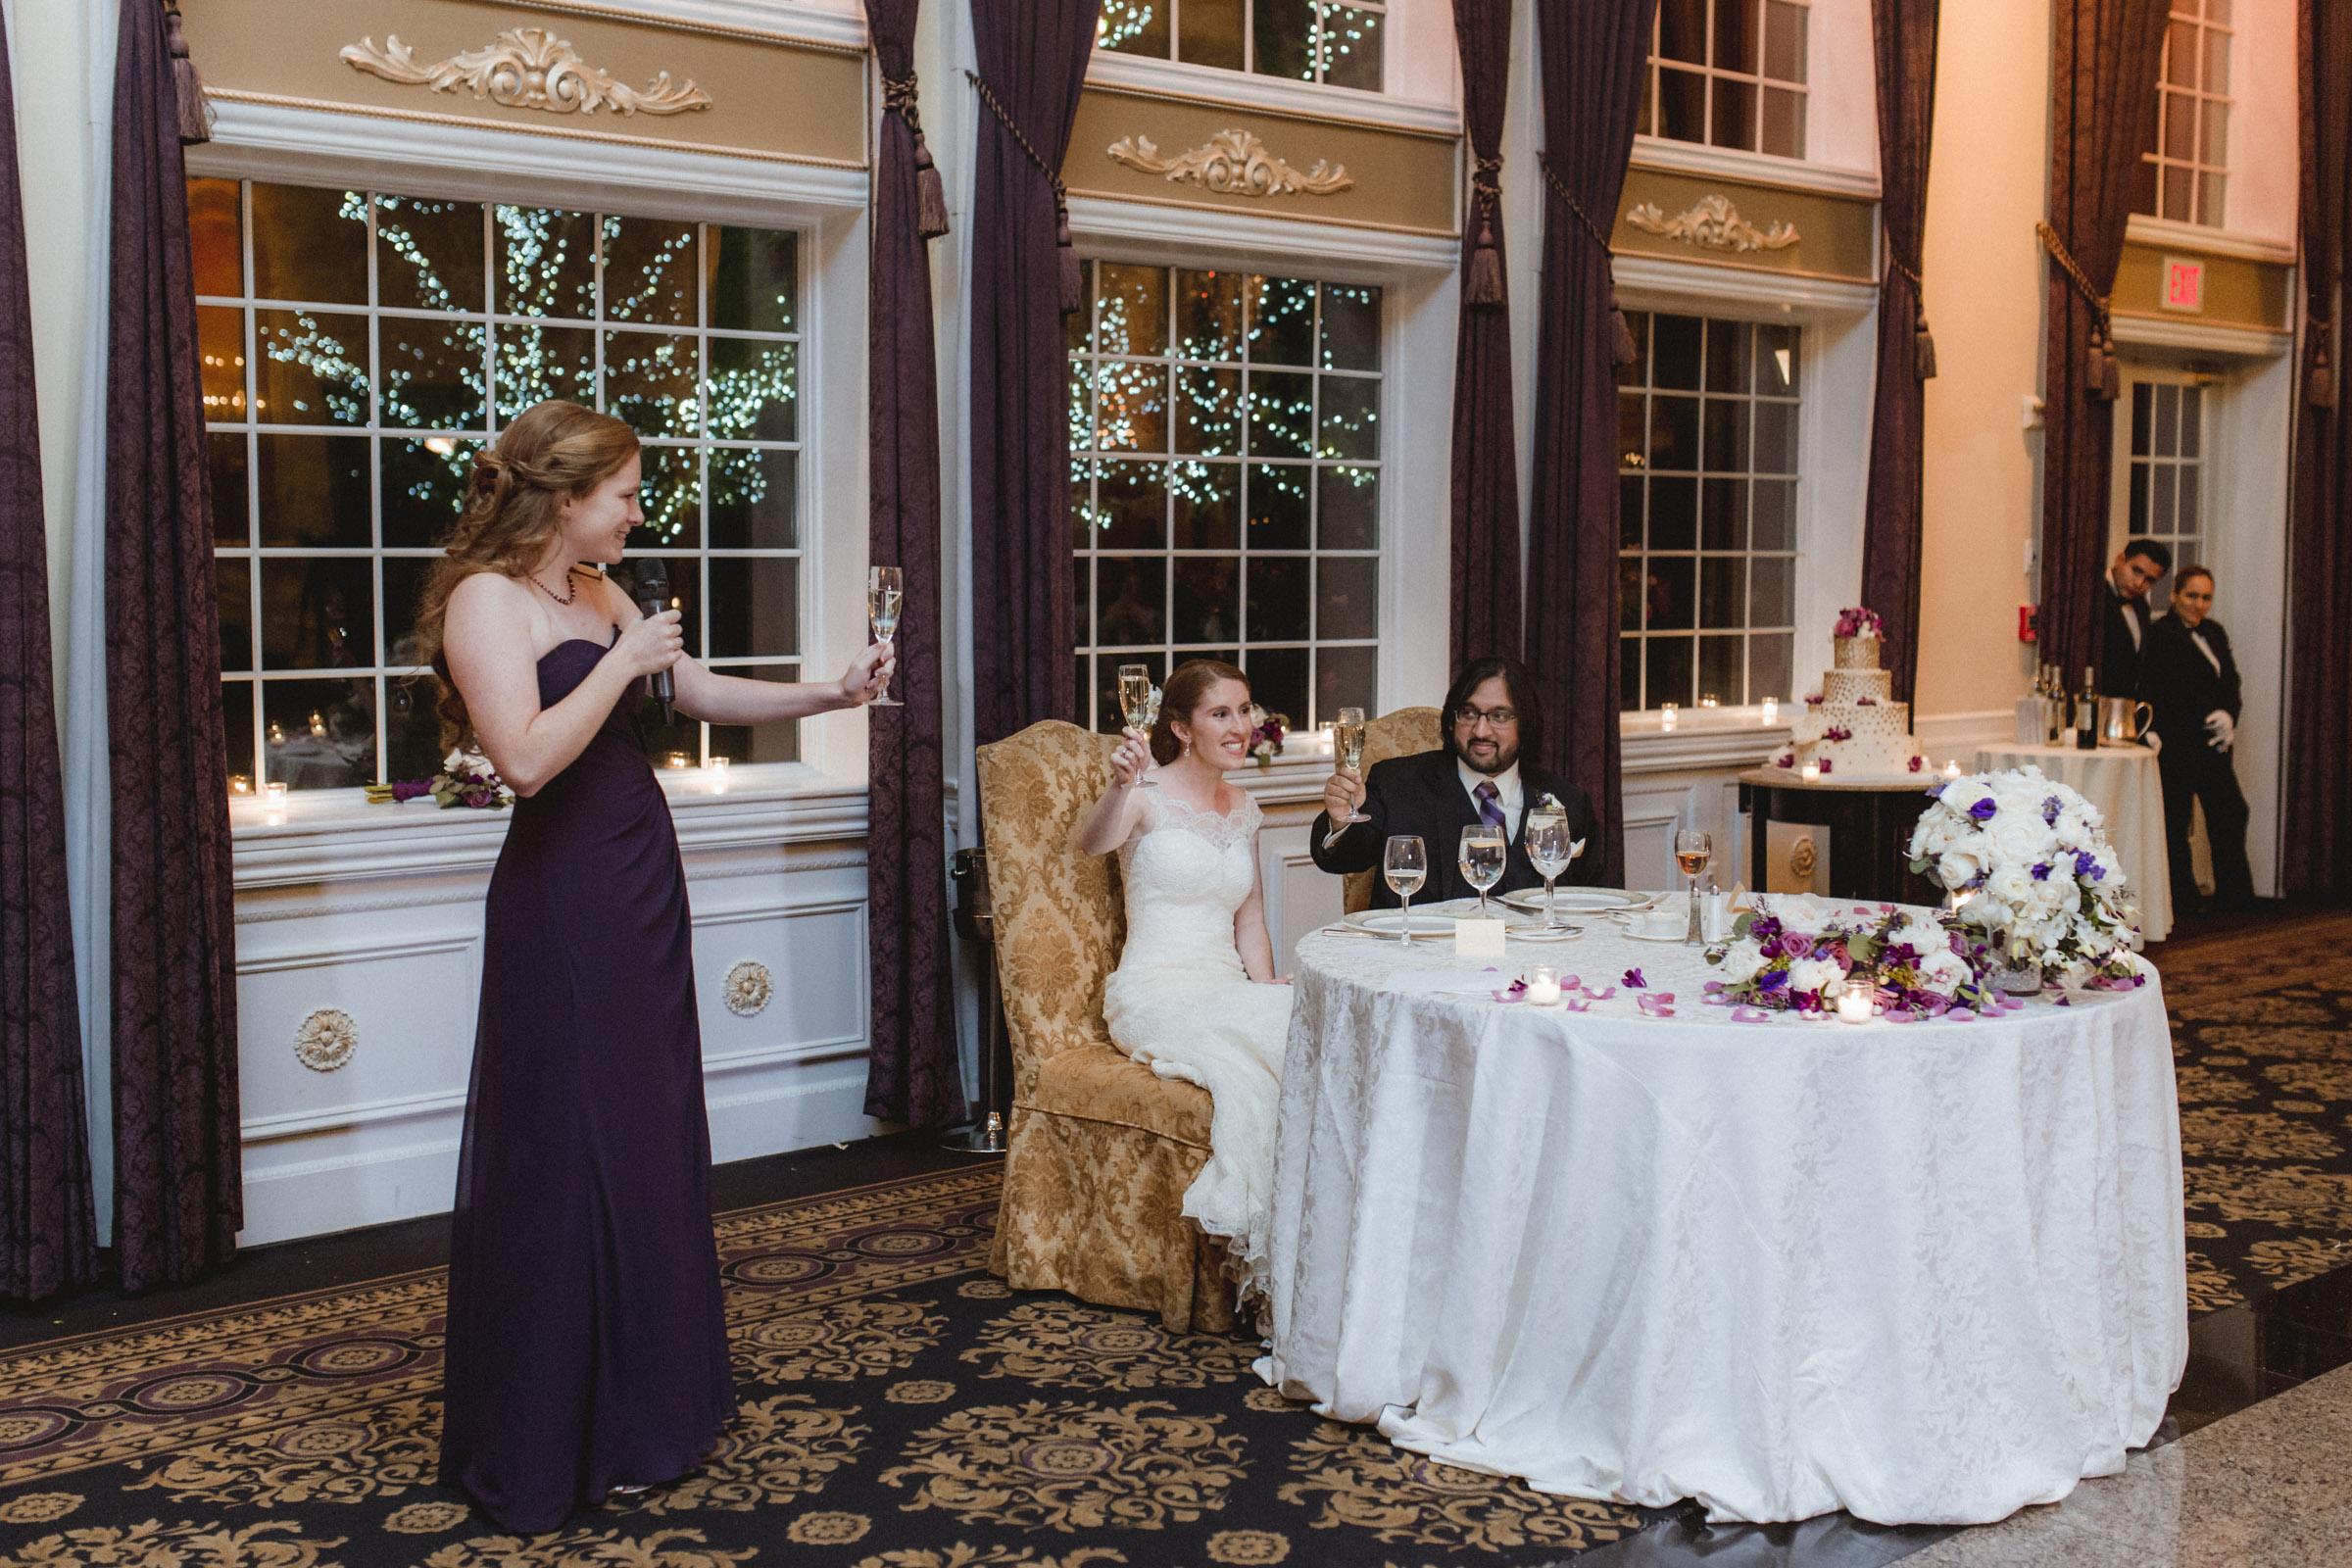 Maid of Honor toasts the newlyweds - Estate at Florentine Gardens wedding - Hudson Valley Wedding - Kelsey & Anish's wedding - Amy Sims Photography